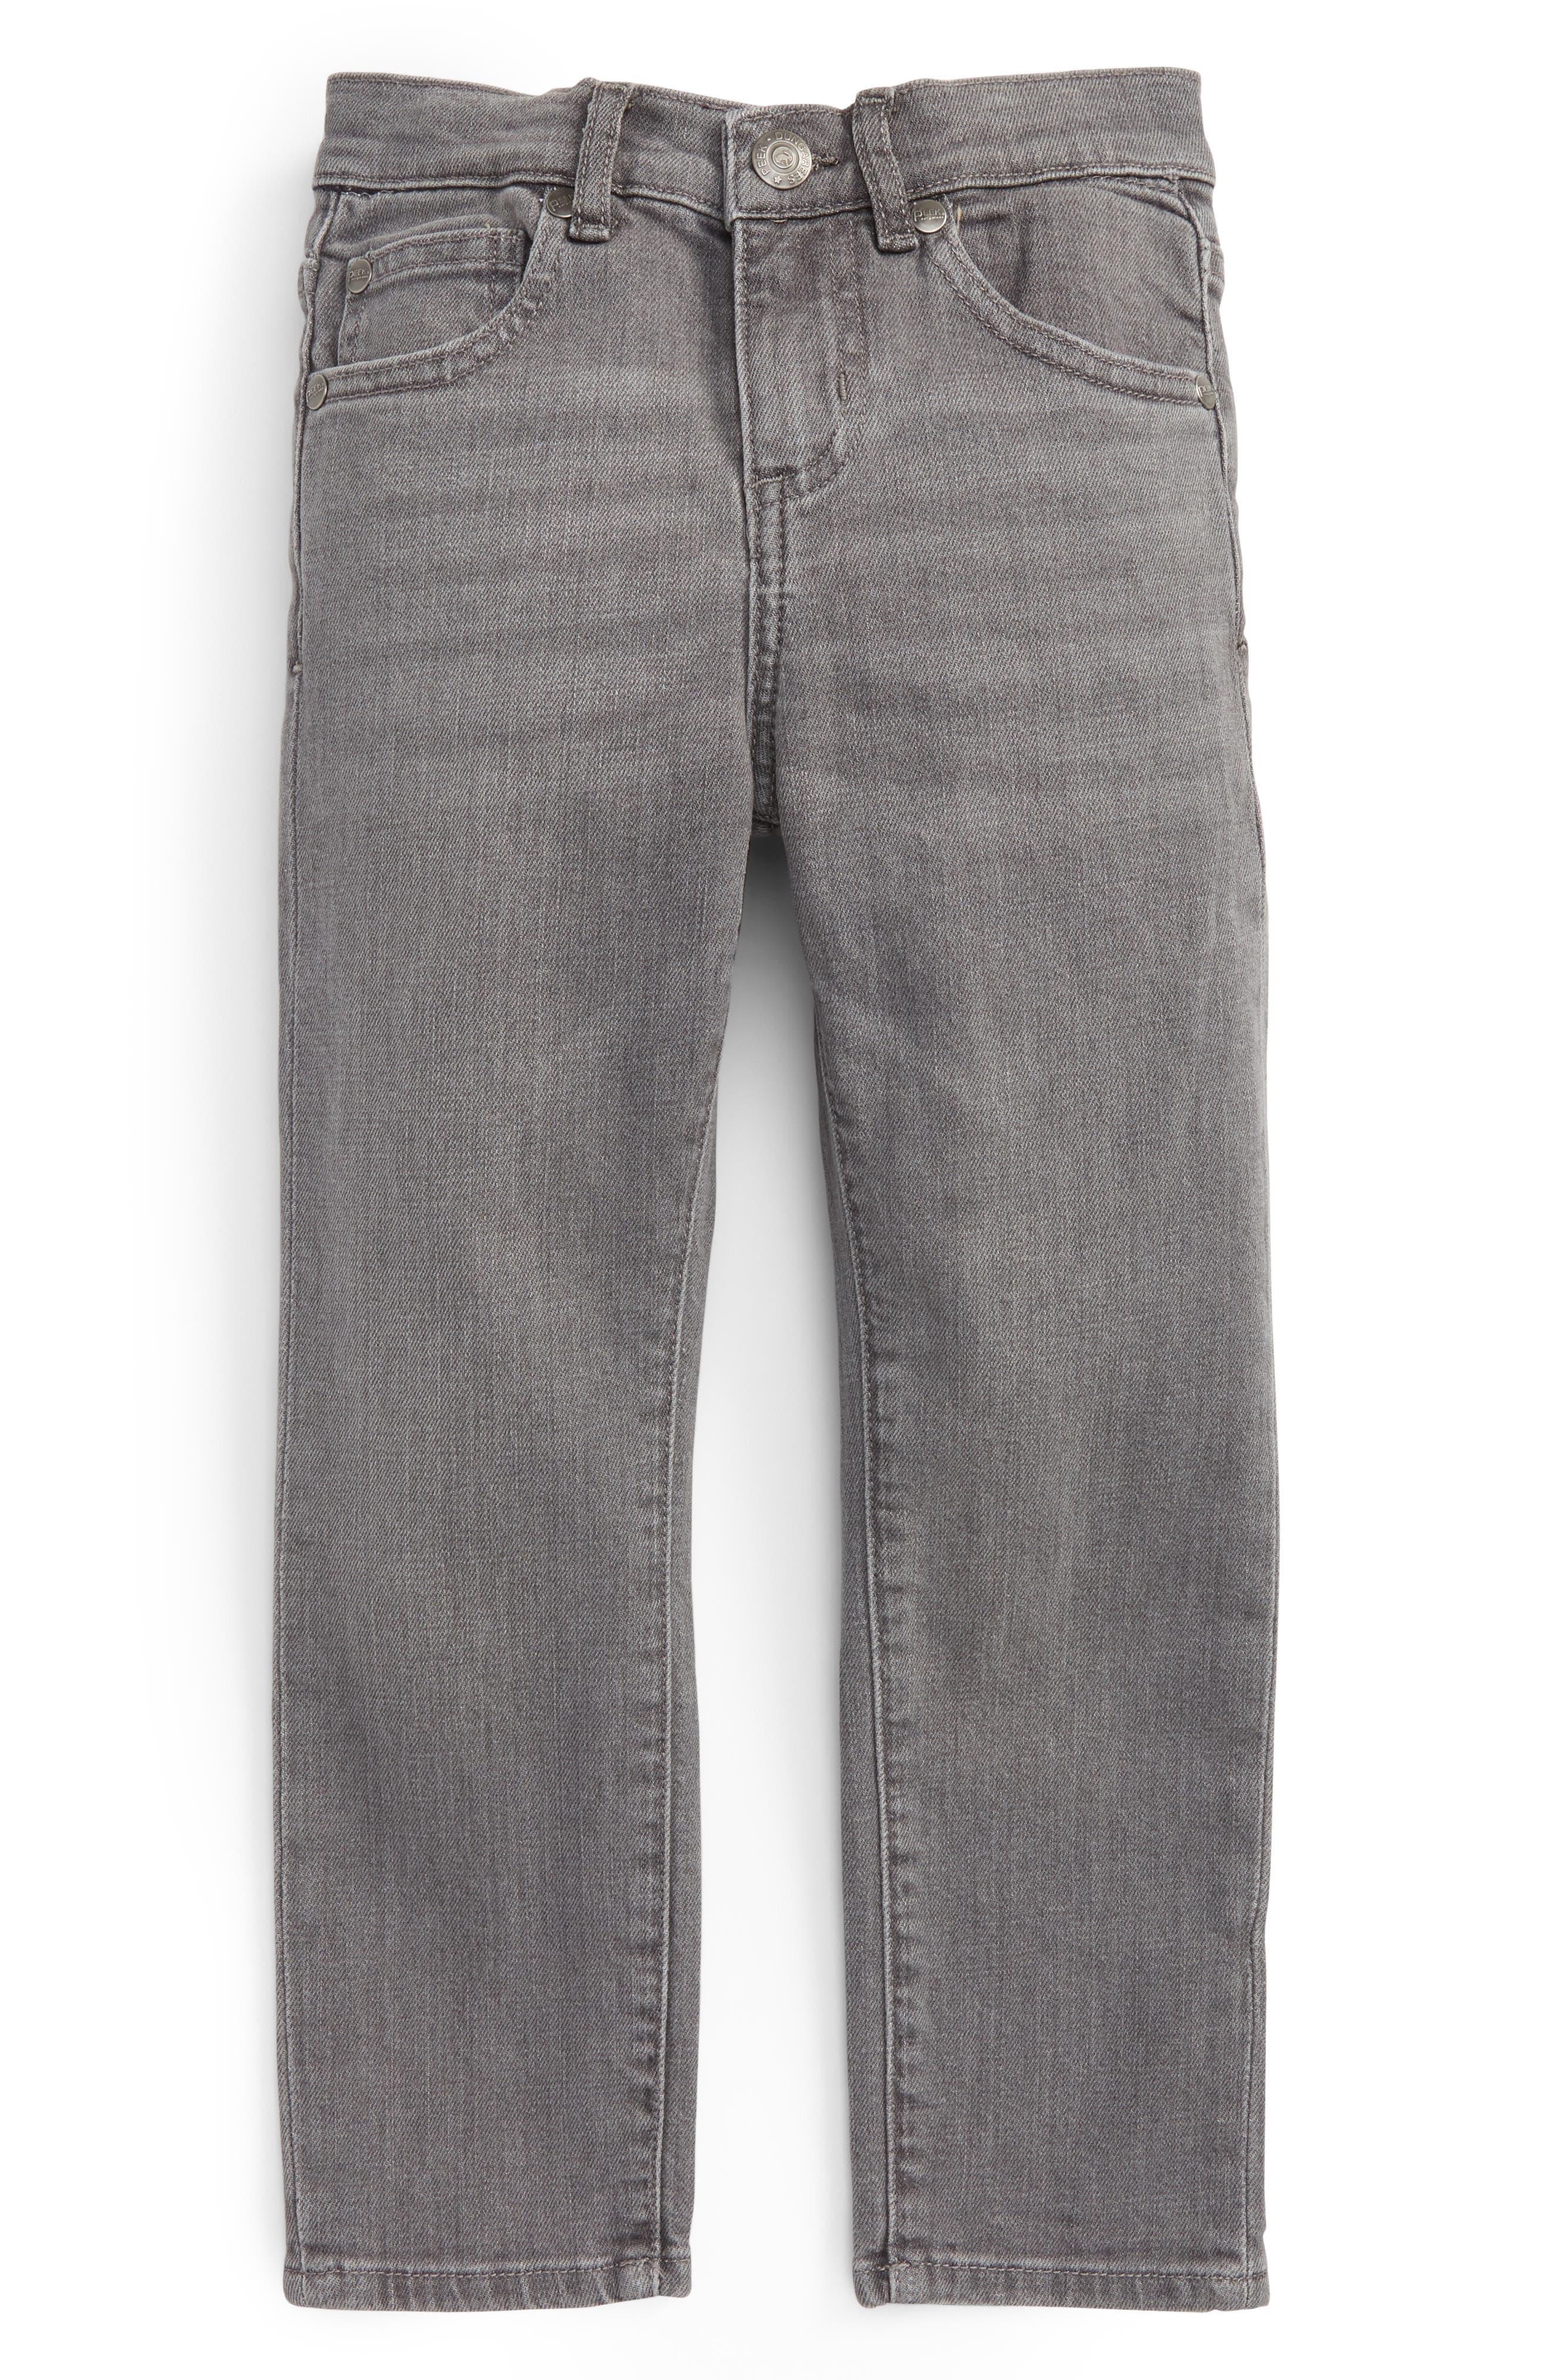 Alternate Image 1 Selected - Peek Slouch Jeans (Toddler Boys, Little Boys & Big Boys)